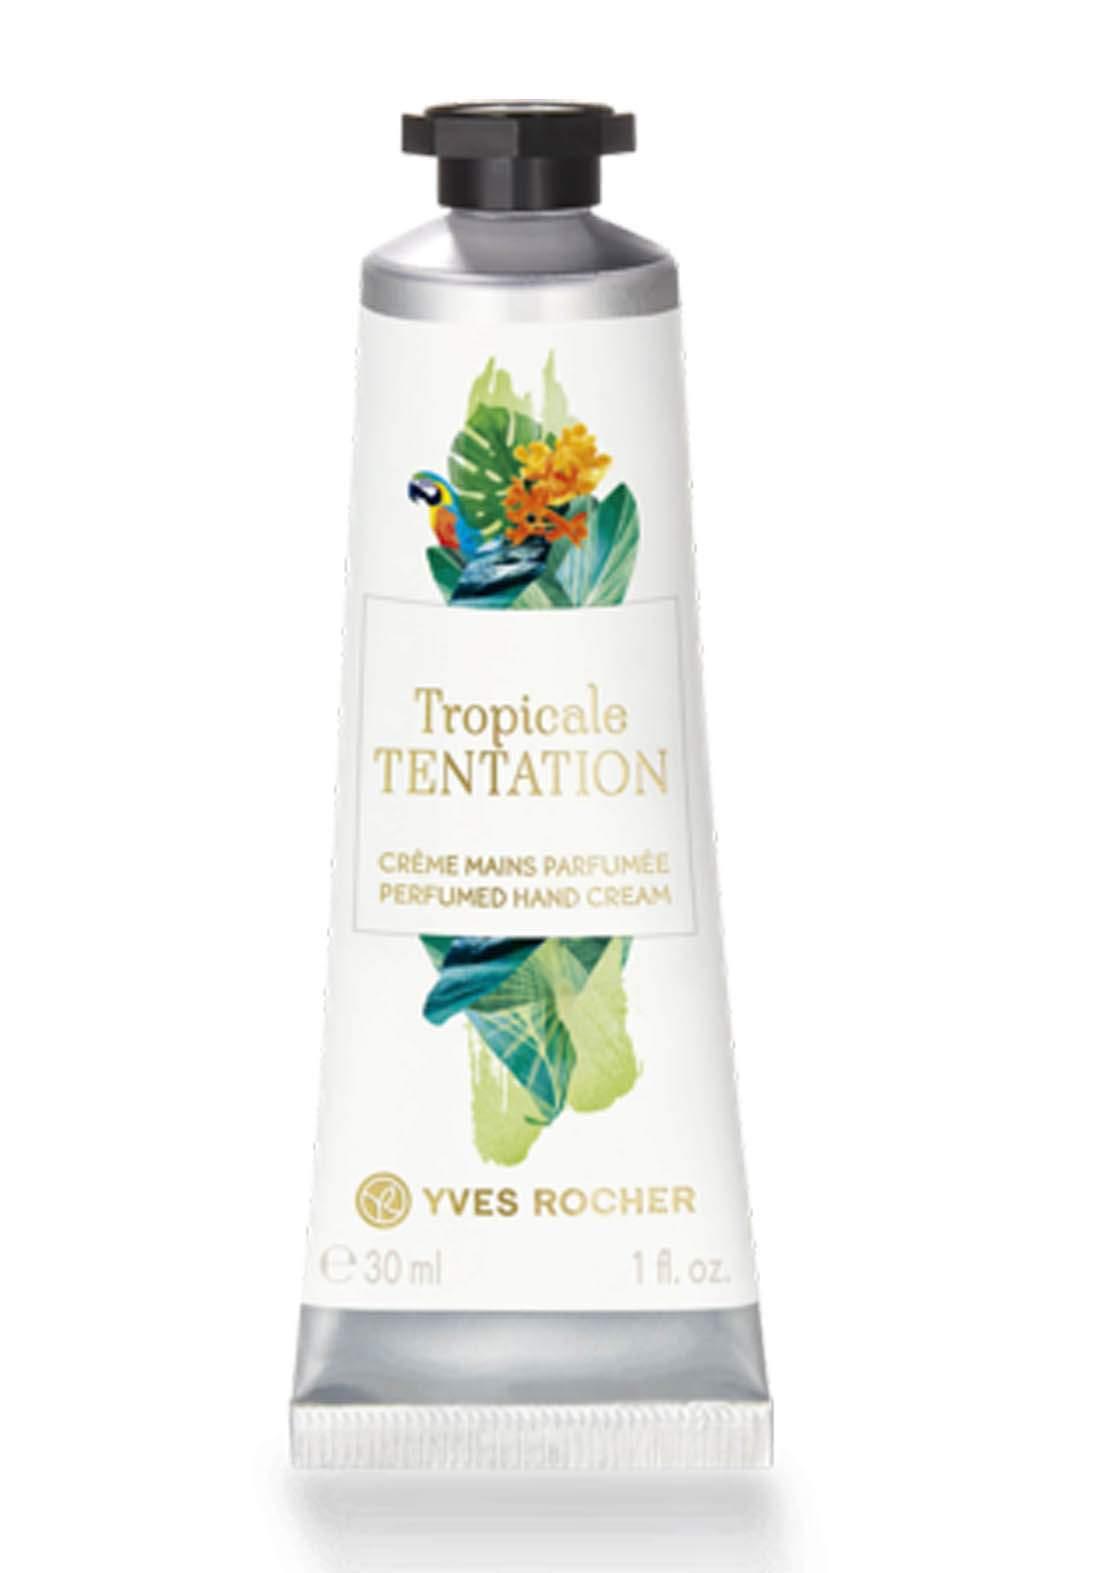 Yves Rocher 62501 Tropicale Tentation Perfumed Hand Cream كريم لليدين